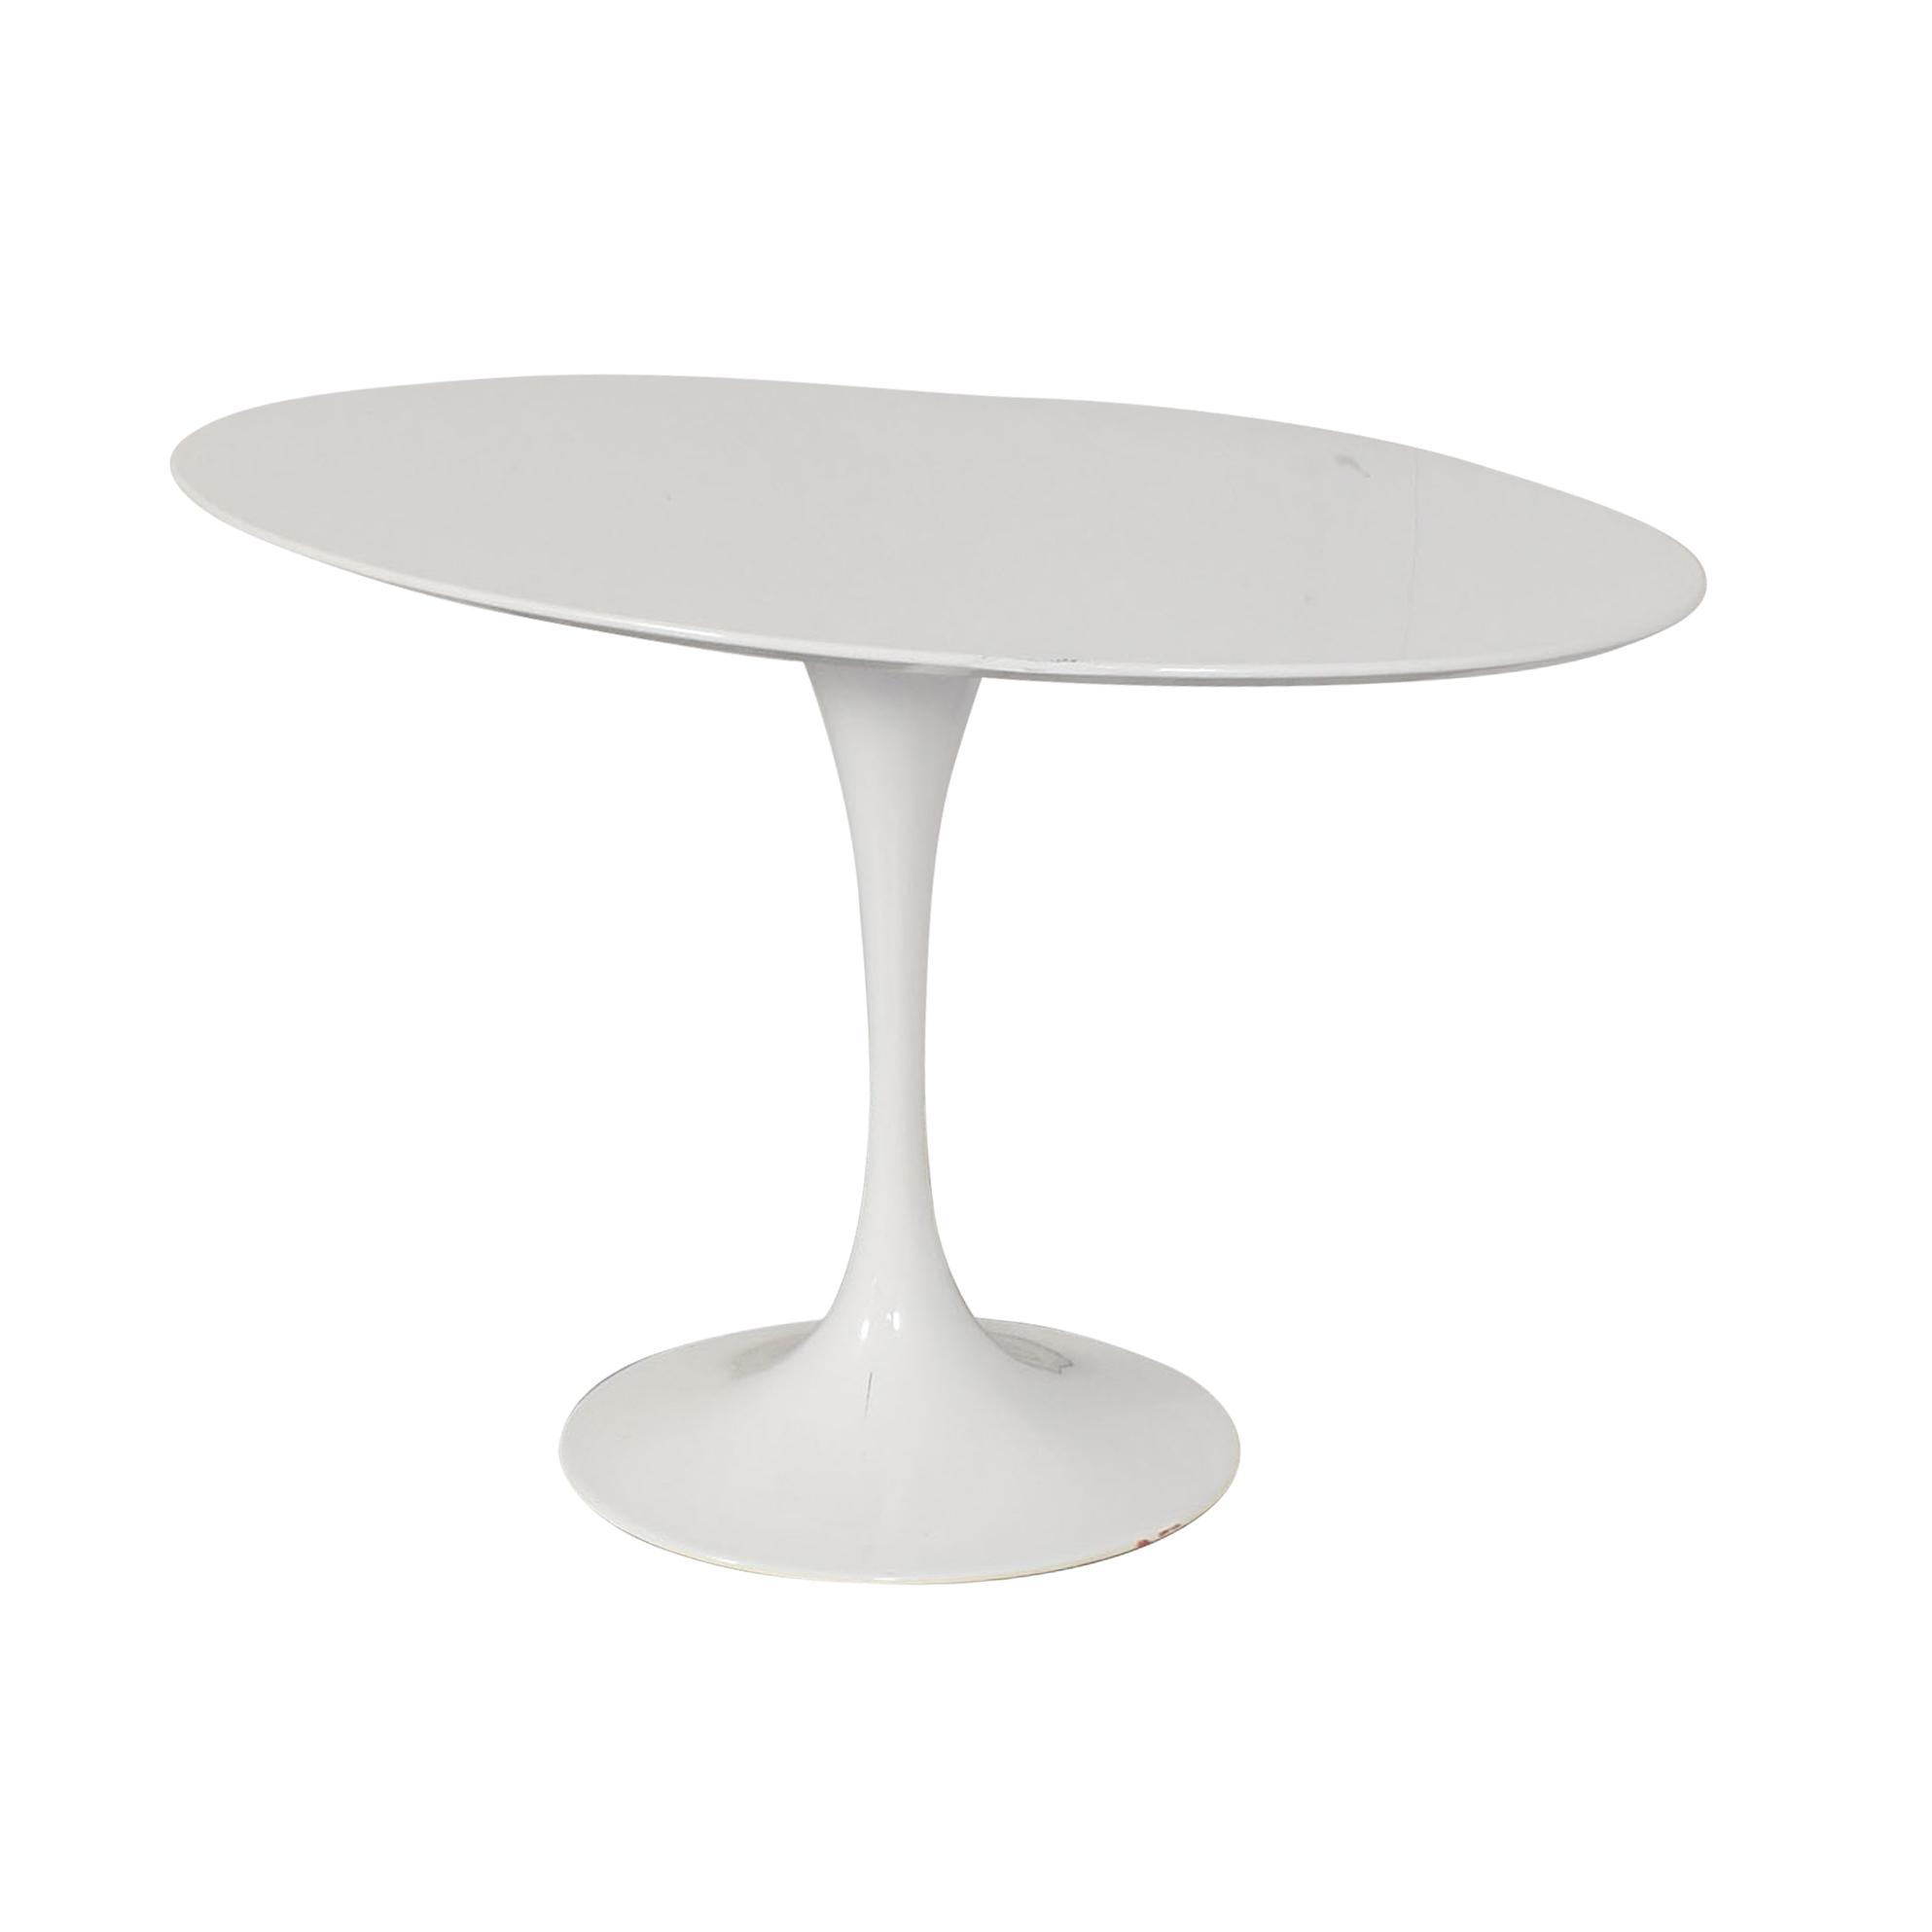 LexMod LexMod Lippa Oval Dining Table ma